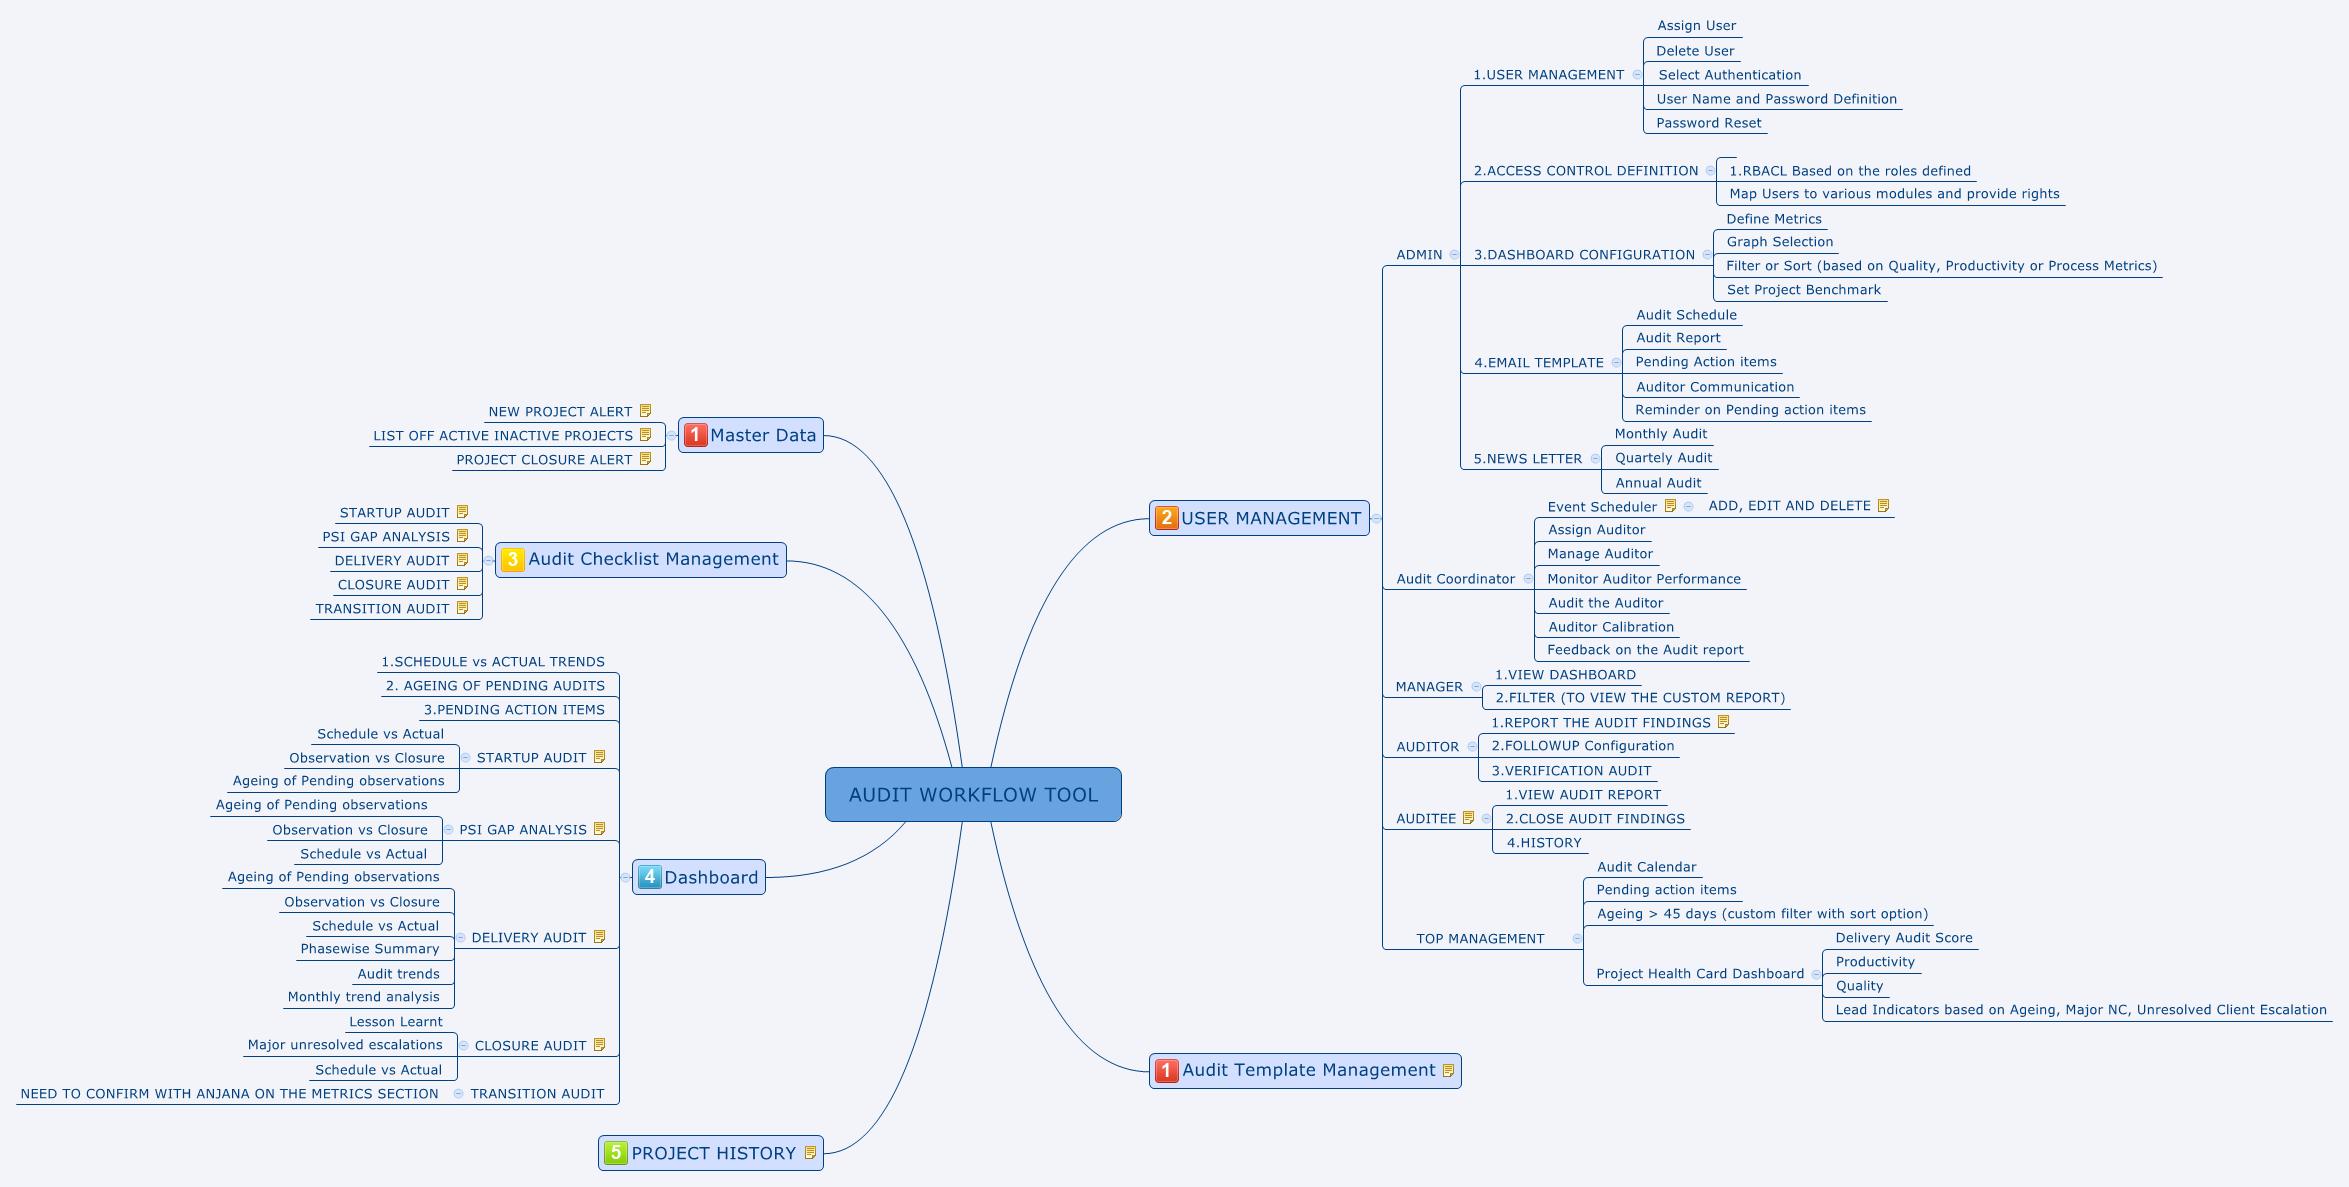 Audit Workflow Tool - Xmind